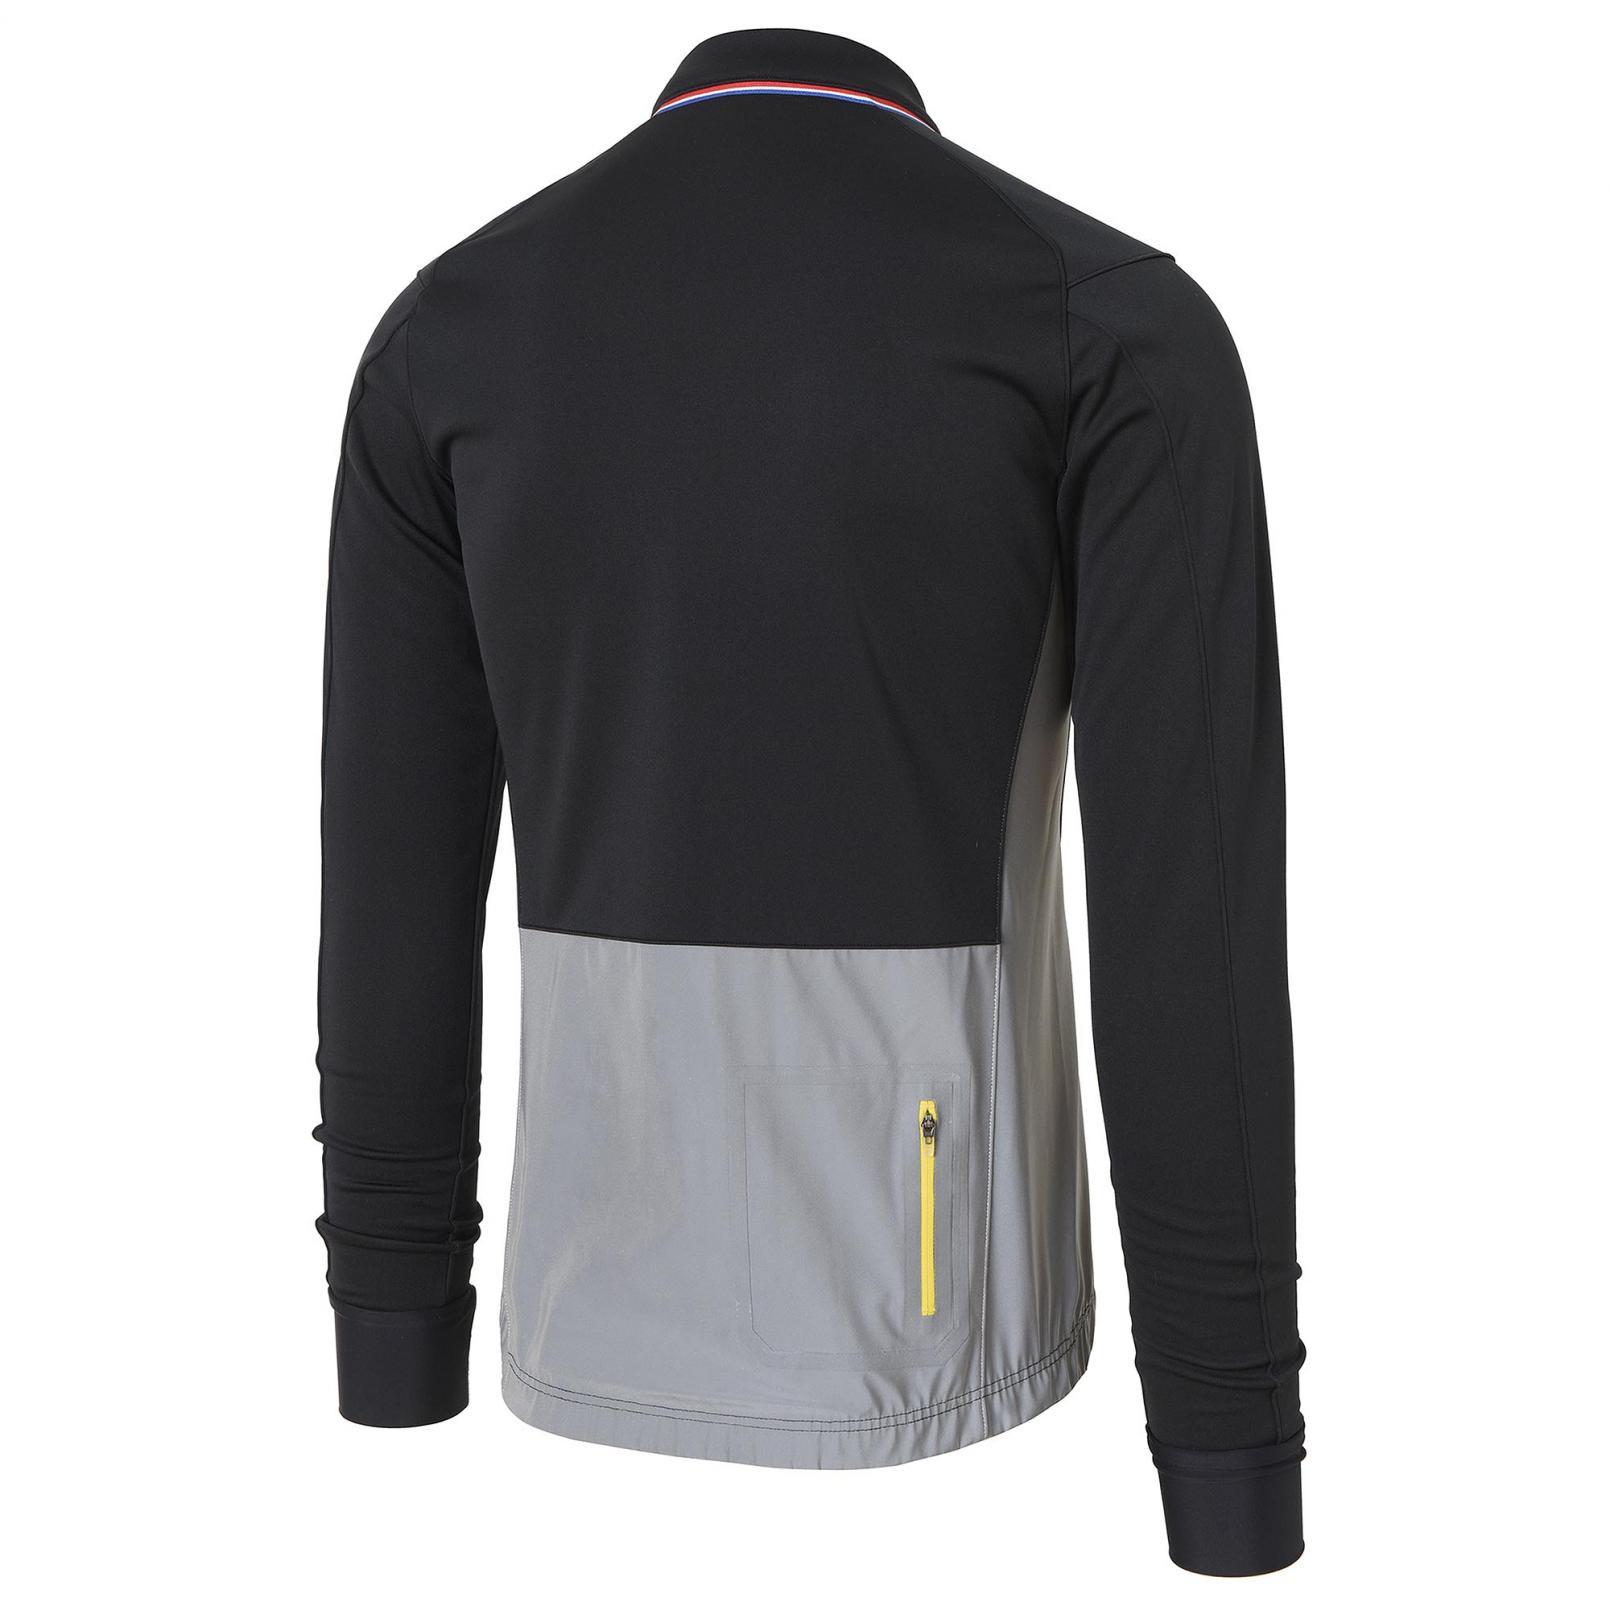 Coats & Jackets – Le Coq Sportif Cycling Softshell Black